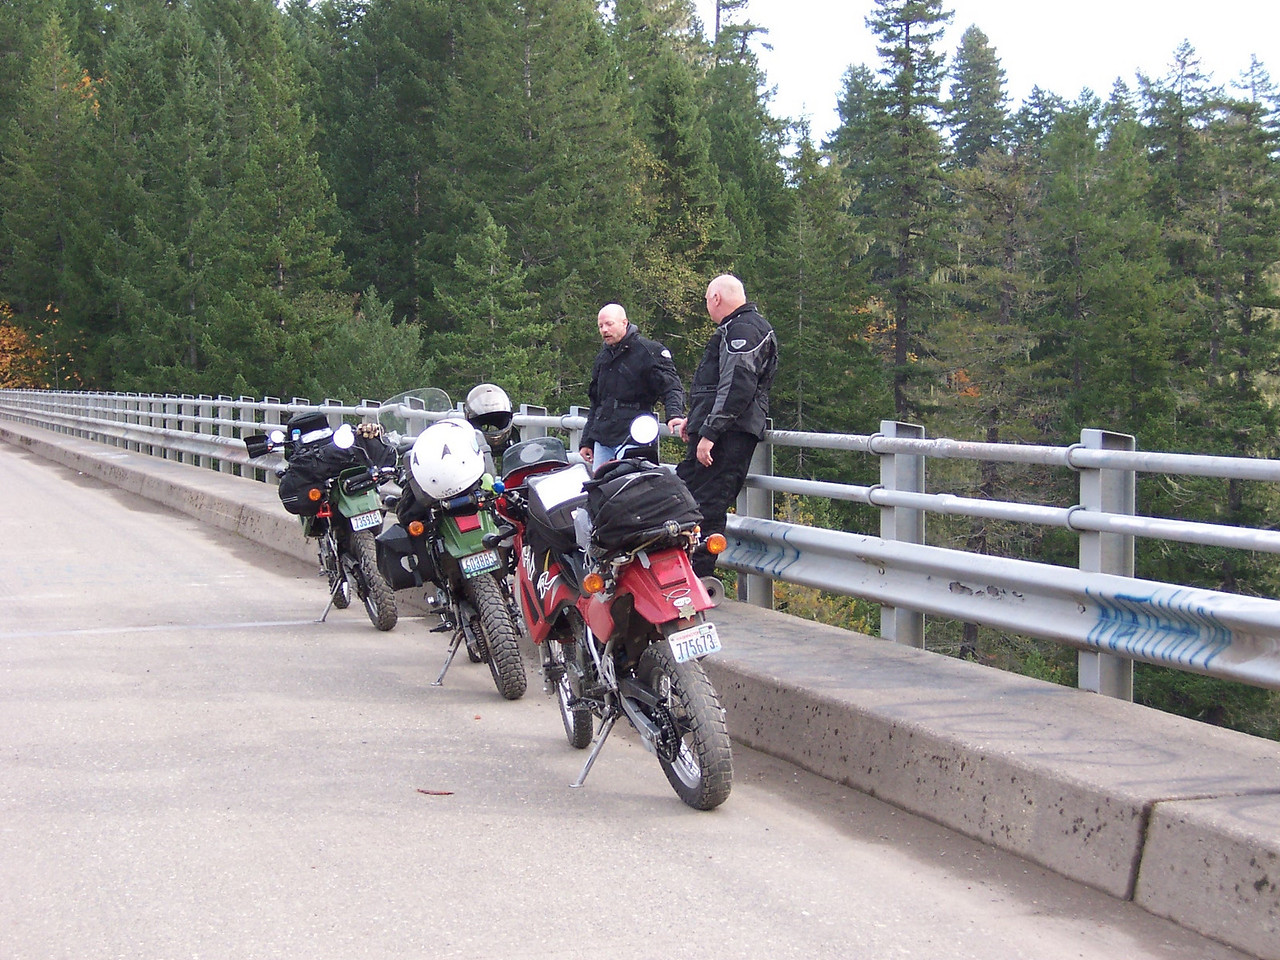 On the High Steel Bridge